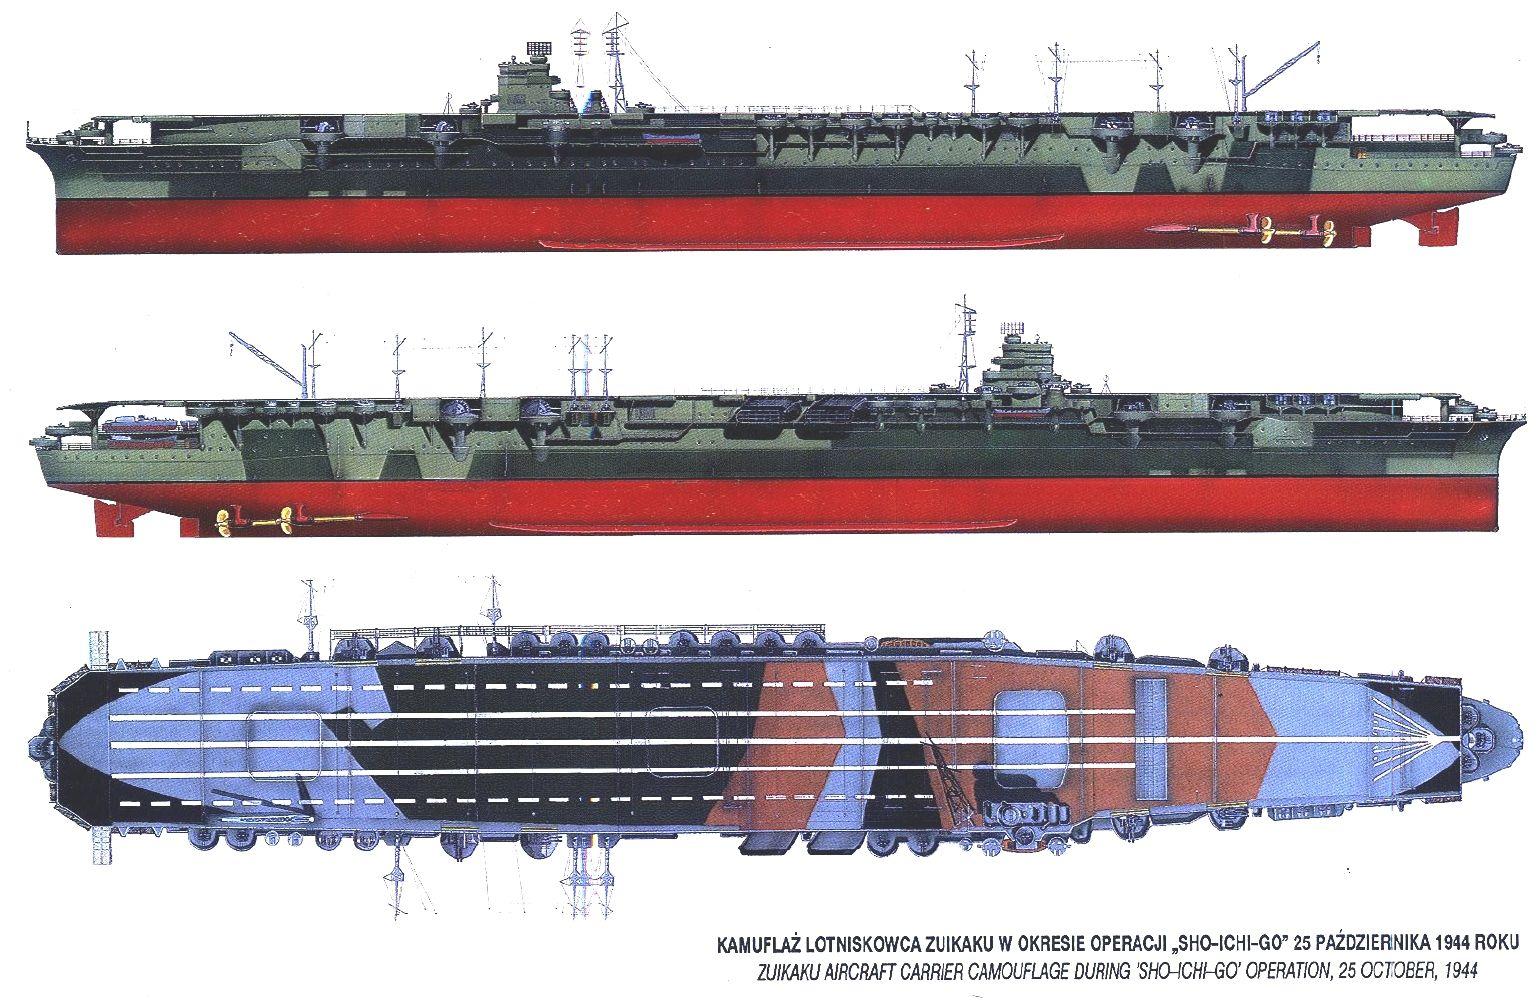 IJN Aircraft Carrier Zuikaku Warships Diagram 70